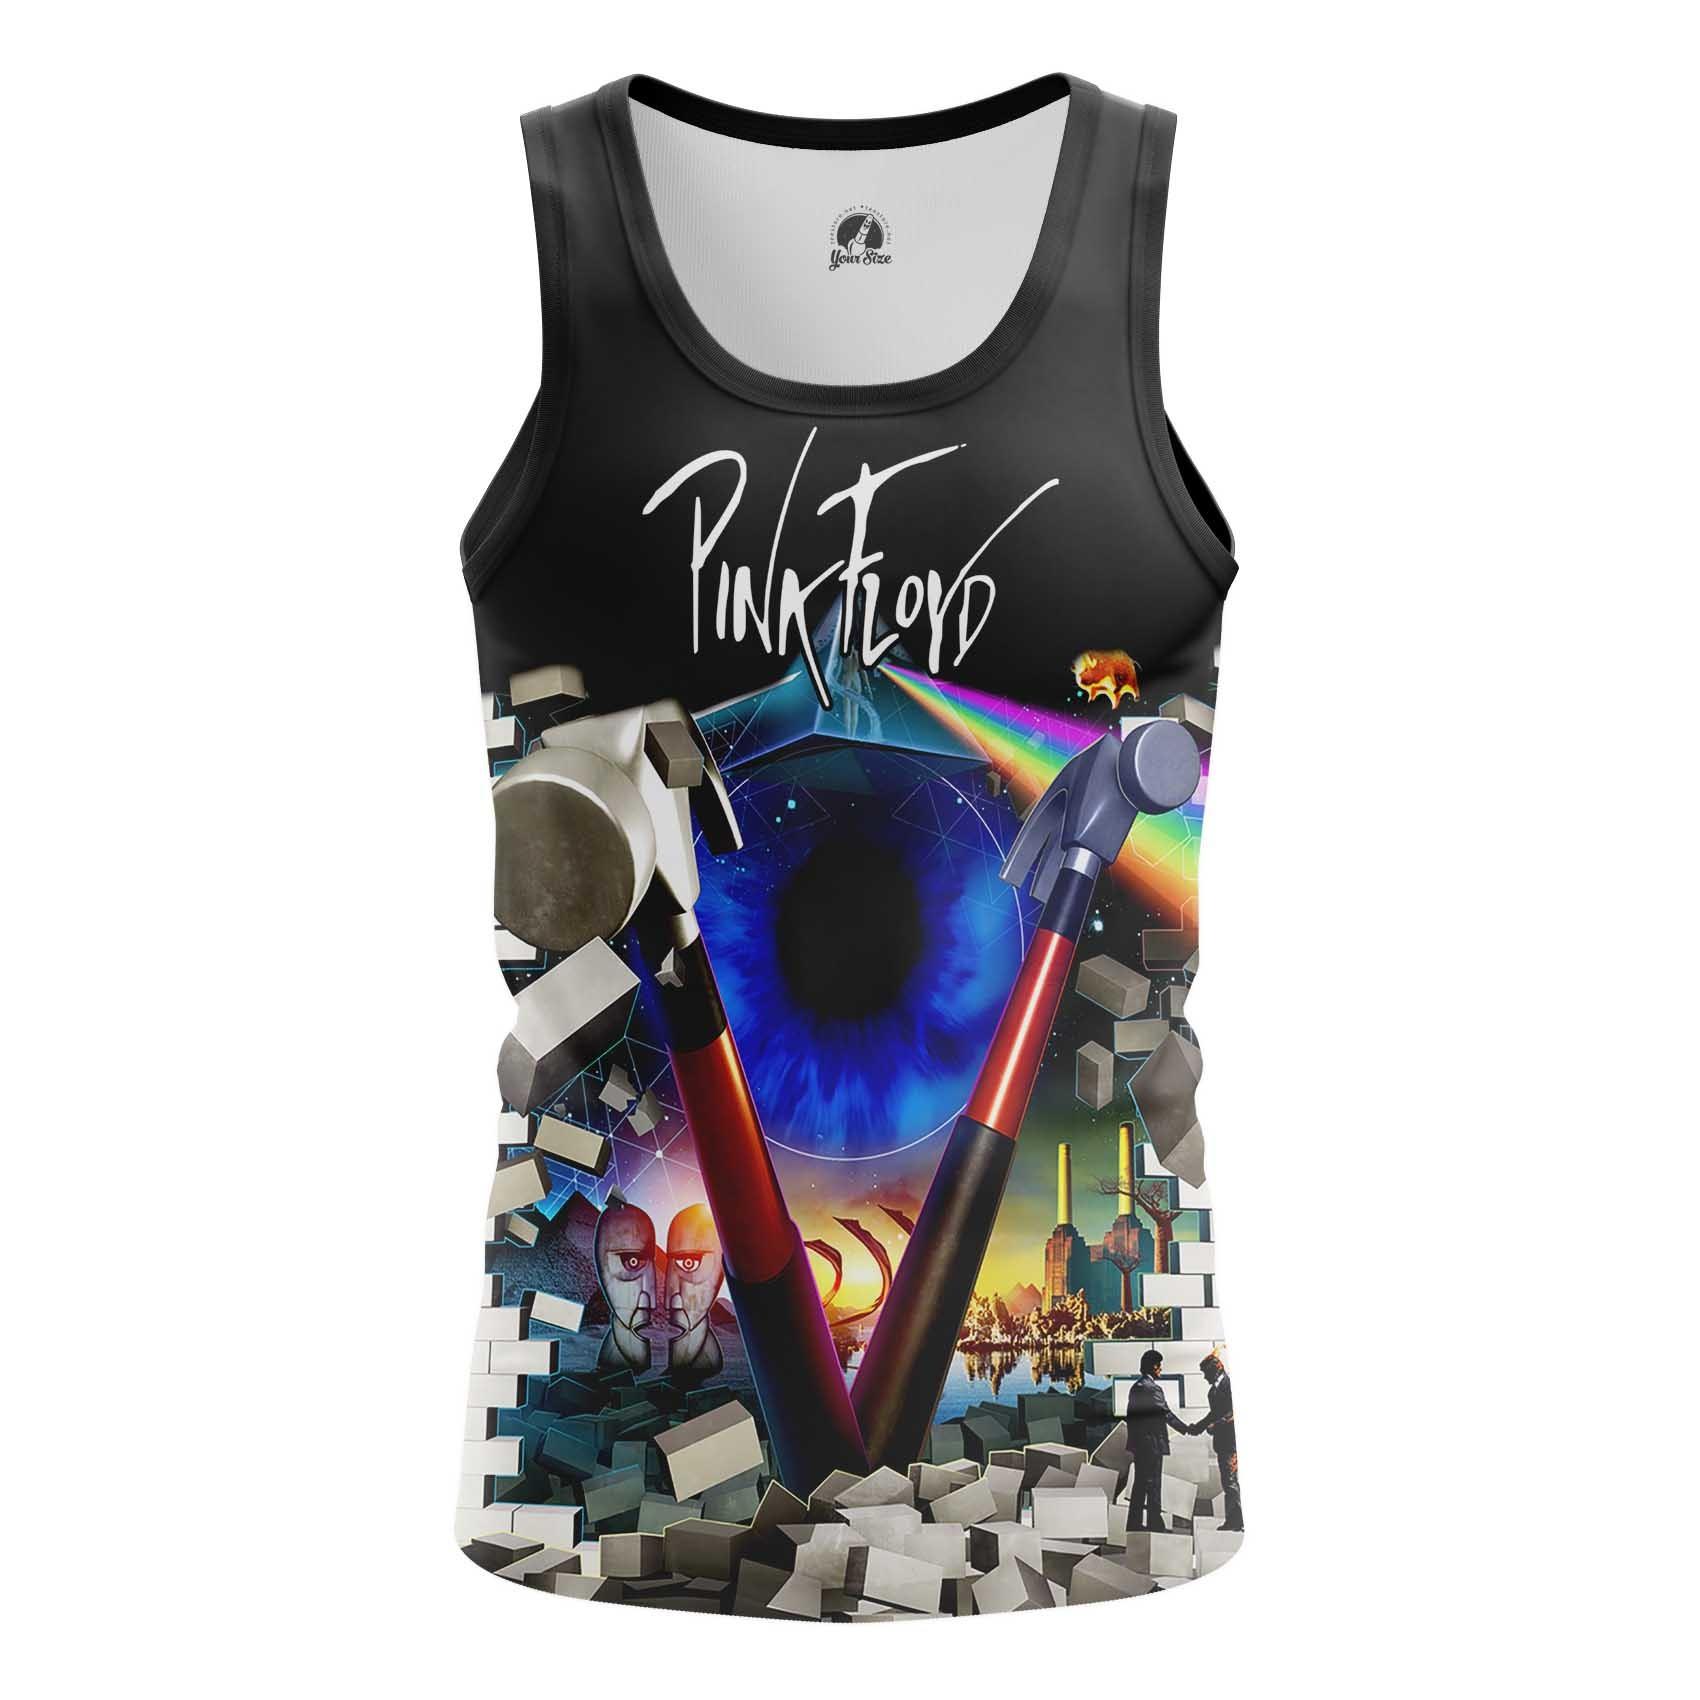 Merchandise Long Sleeve Pink Floyd Music Band